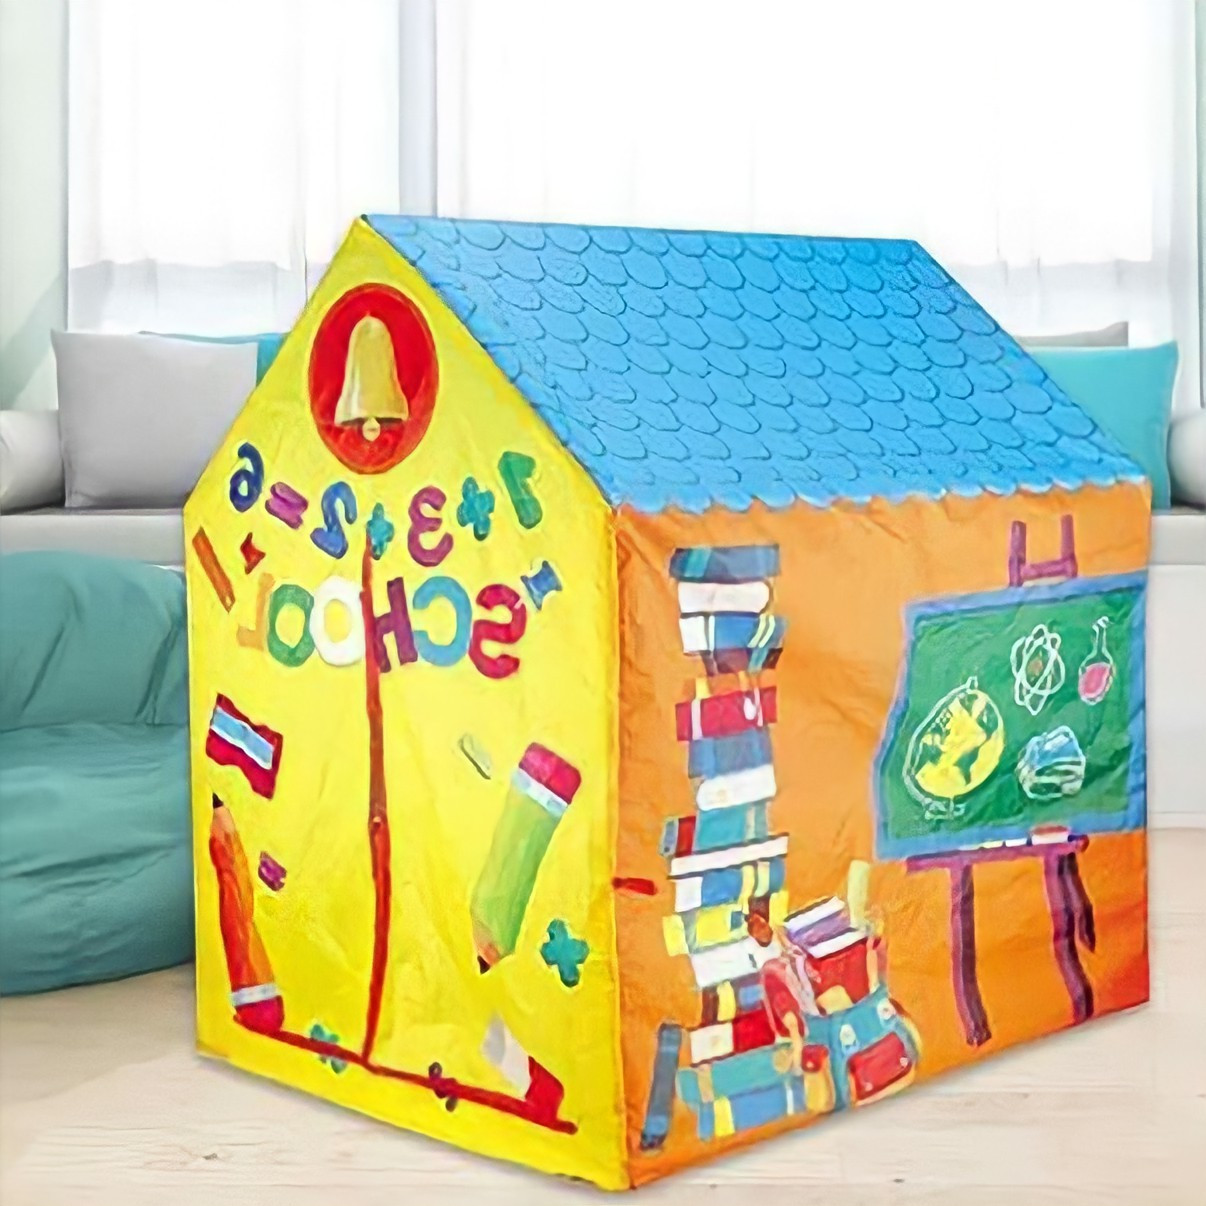 "Игровая палатка-домик School House / Детская палатка-домик ""Школа"""